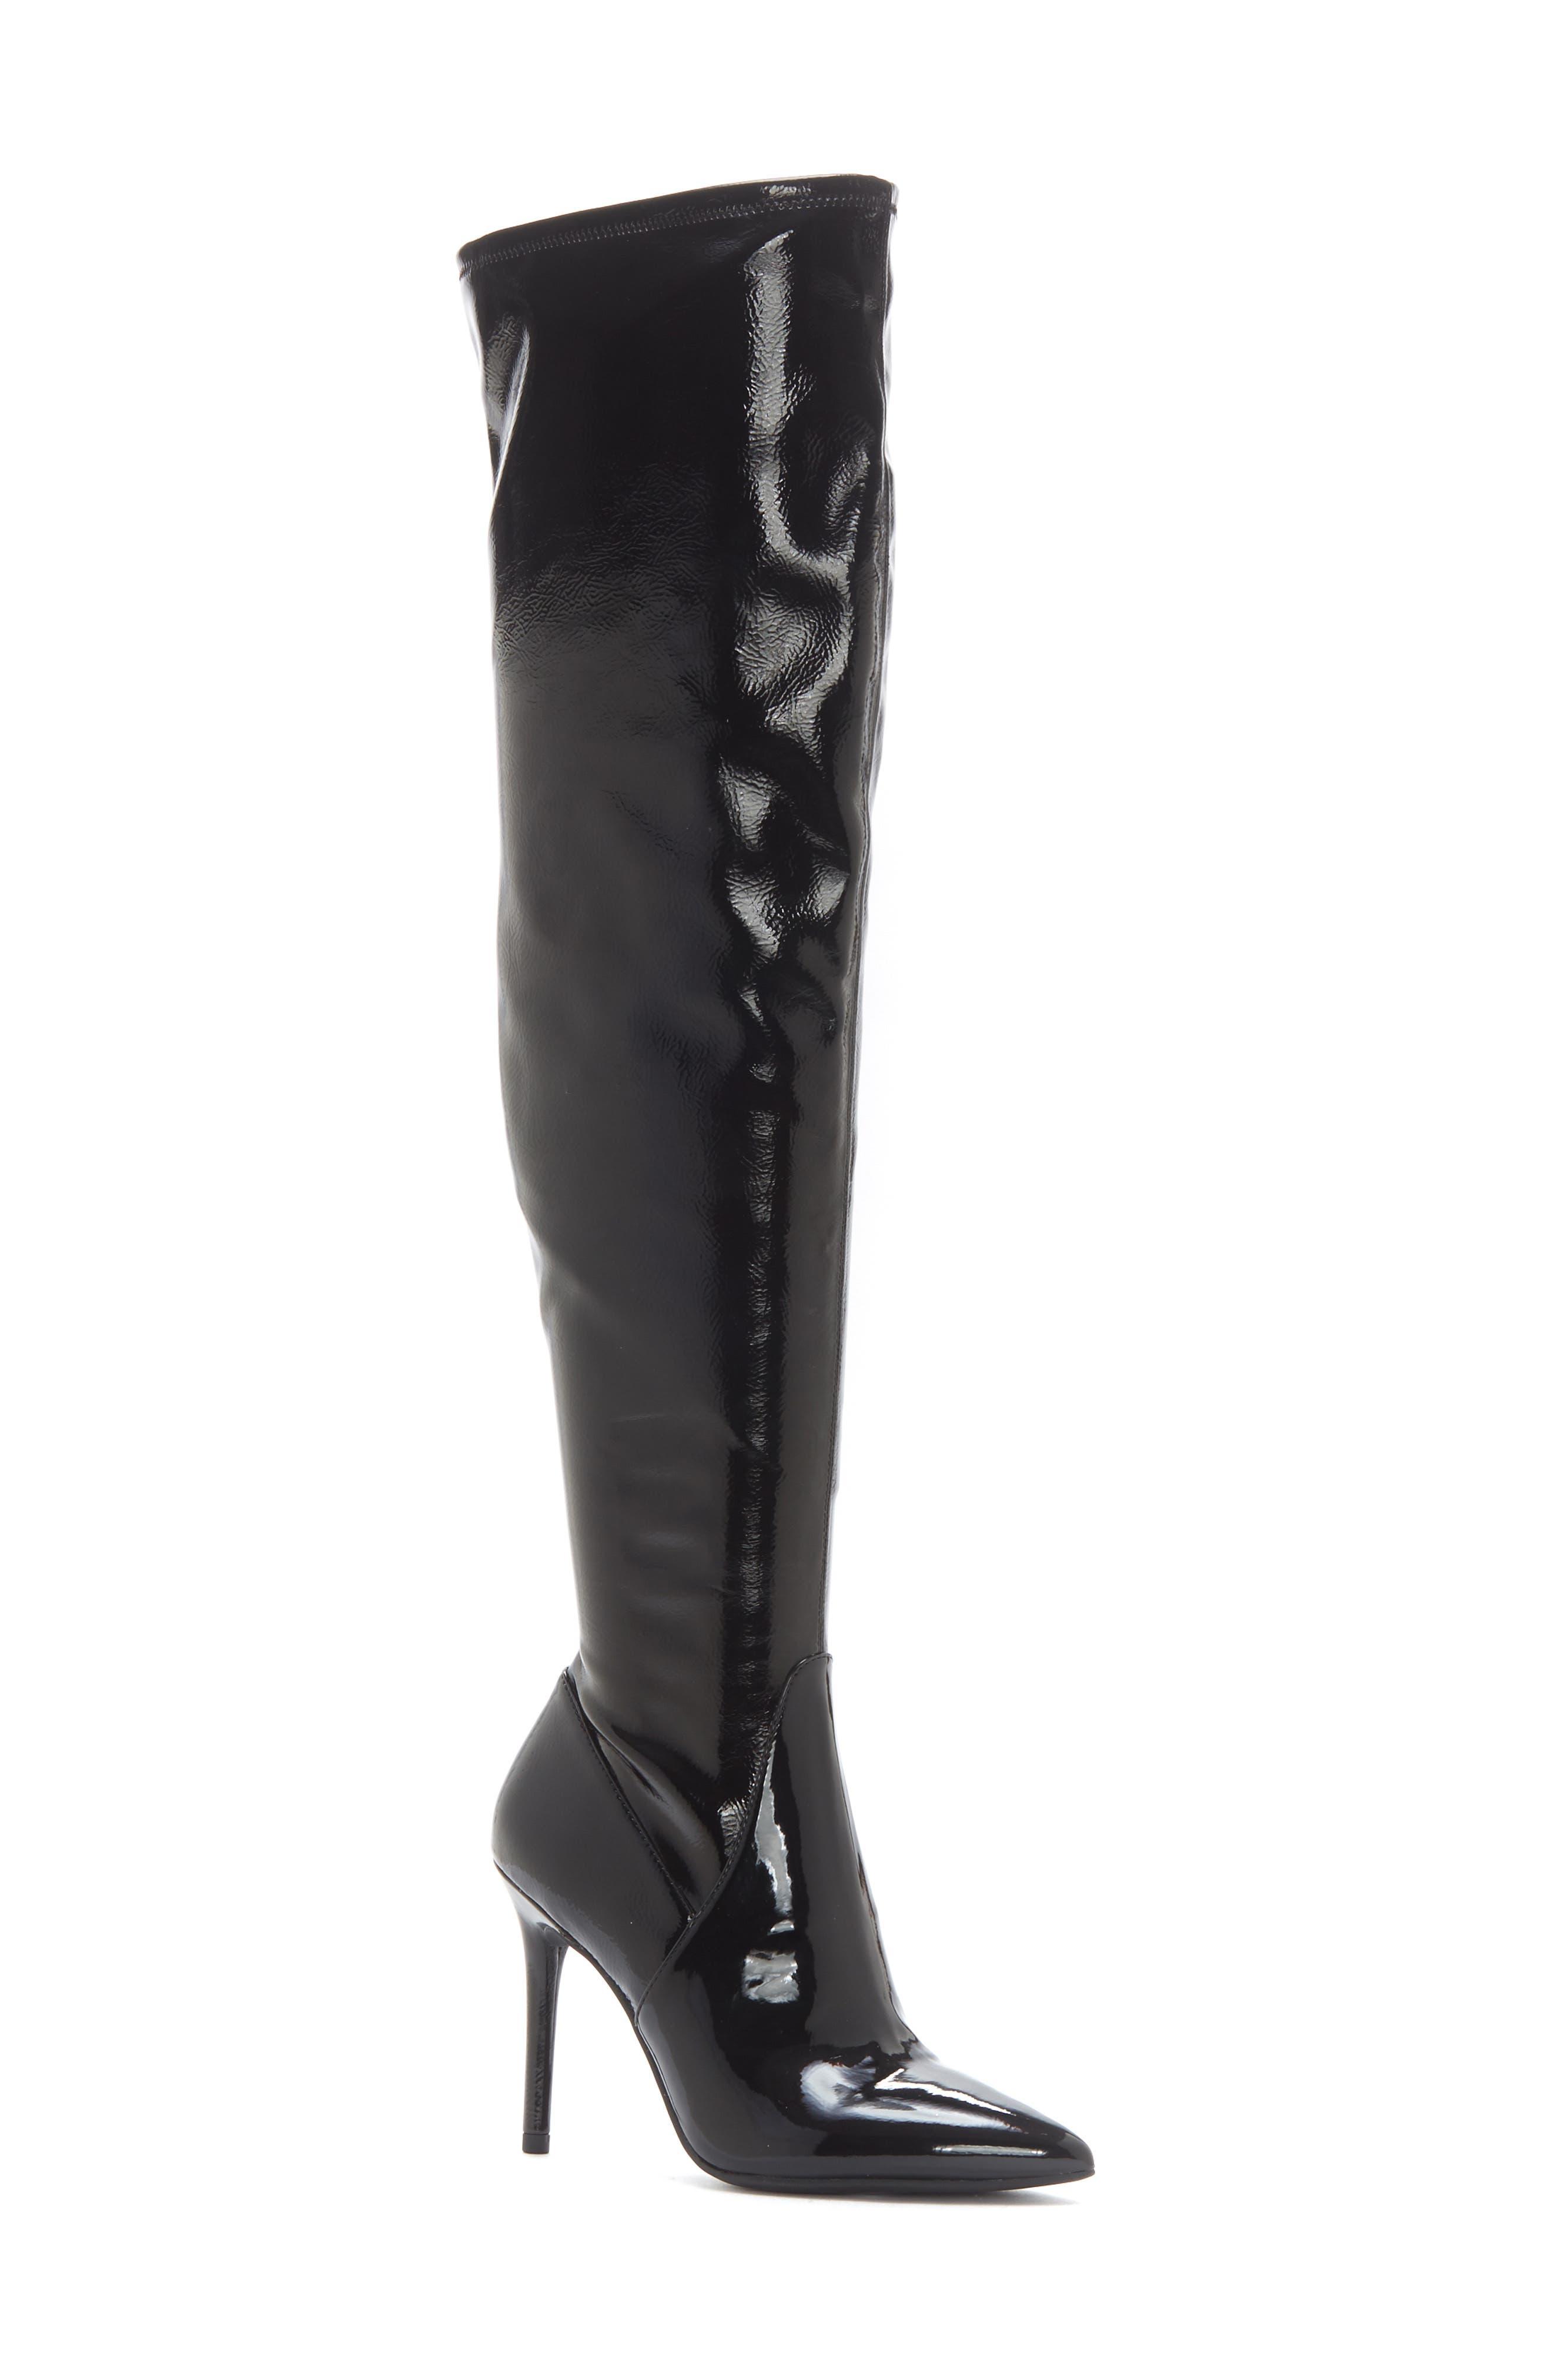 Jessica Simpson Laken Over The Knee Boot- Black